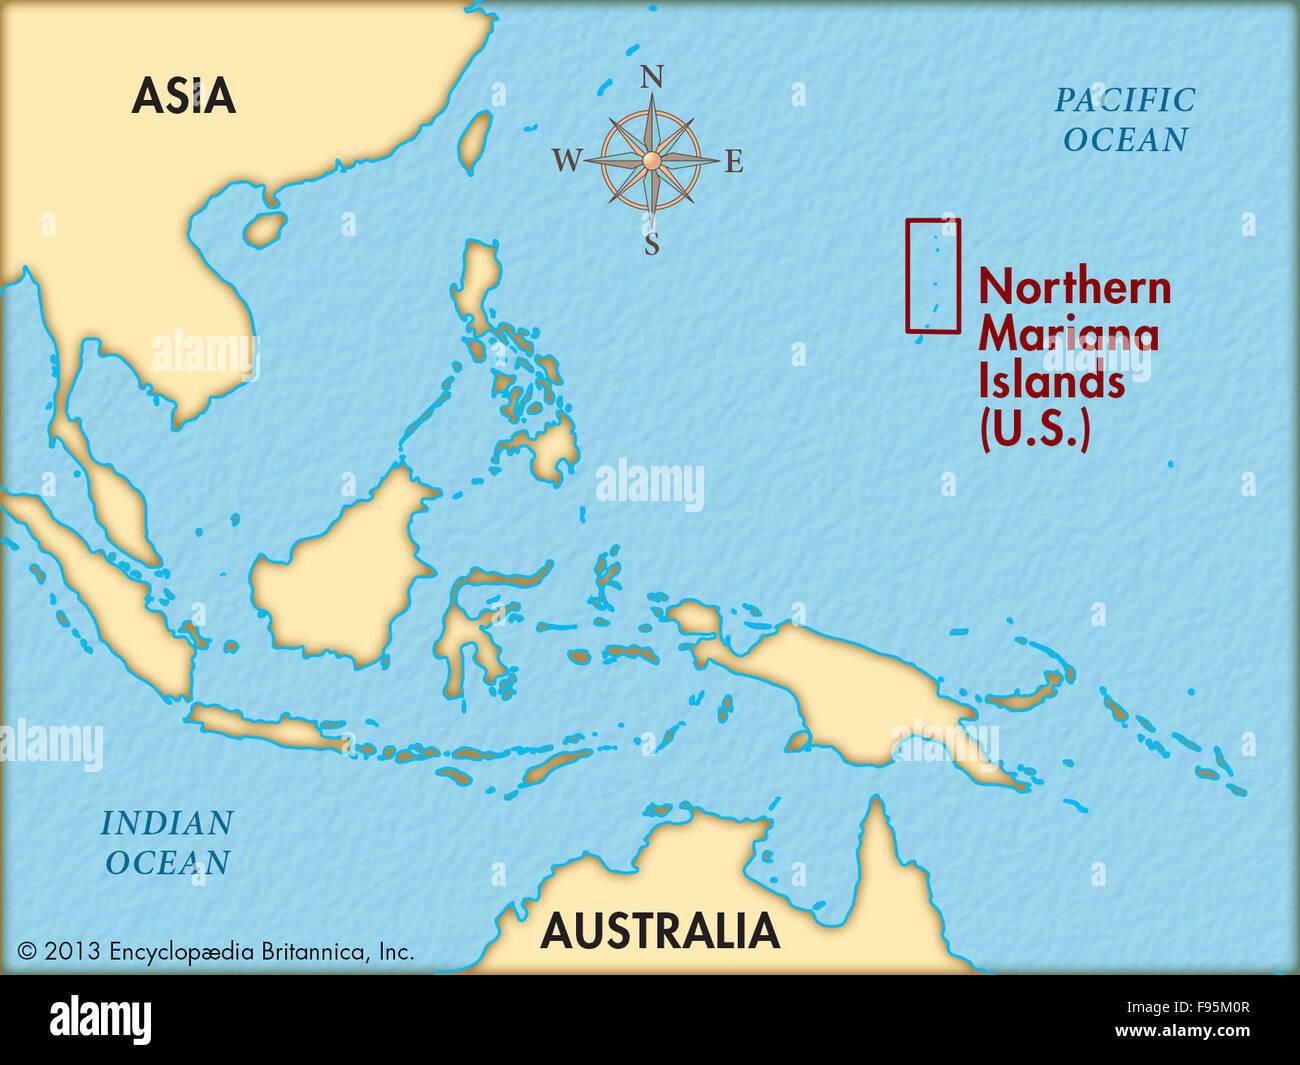 Northern Mariana Islands Stock Photo: 91709207 - Alamy